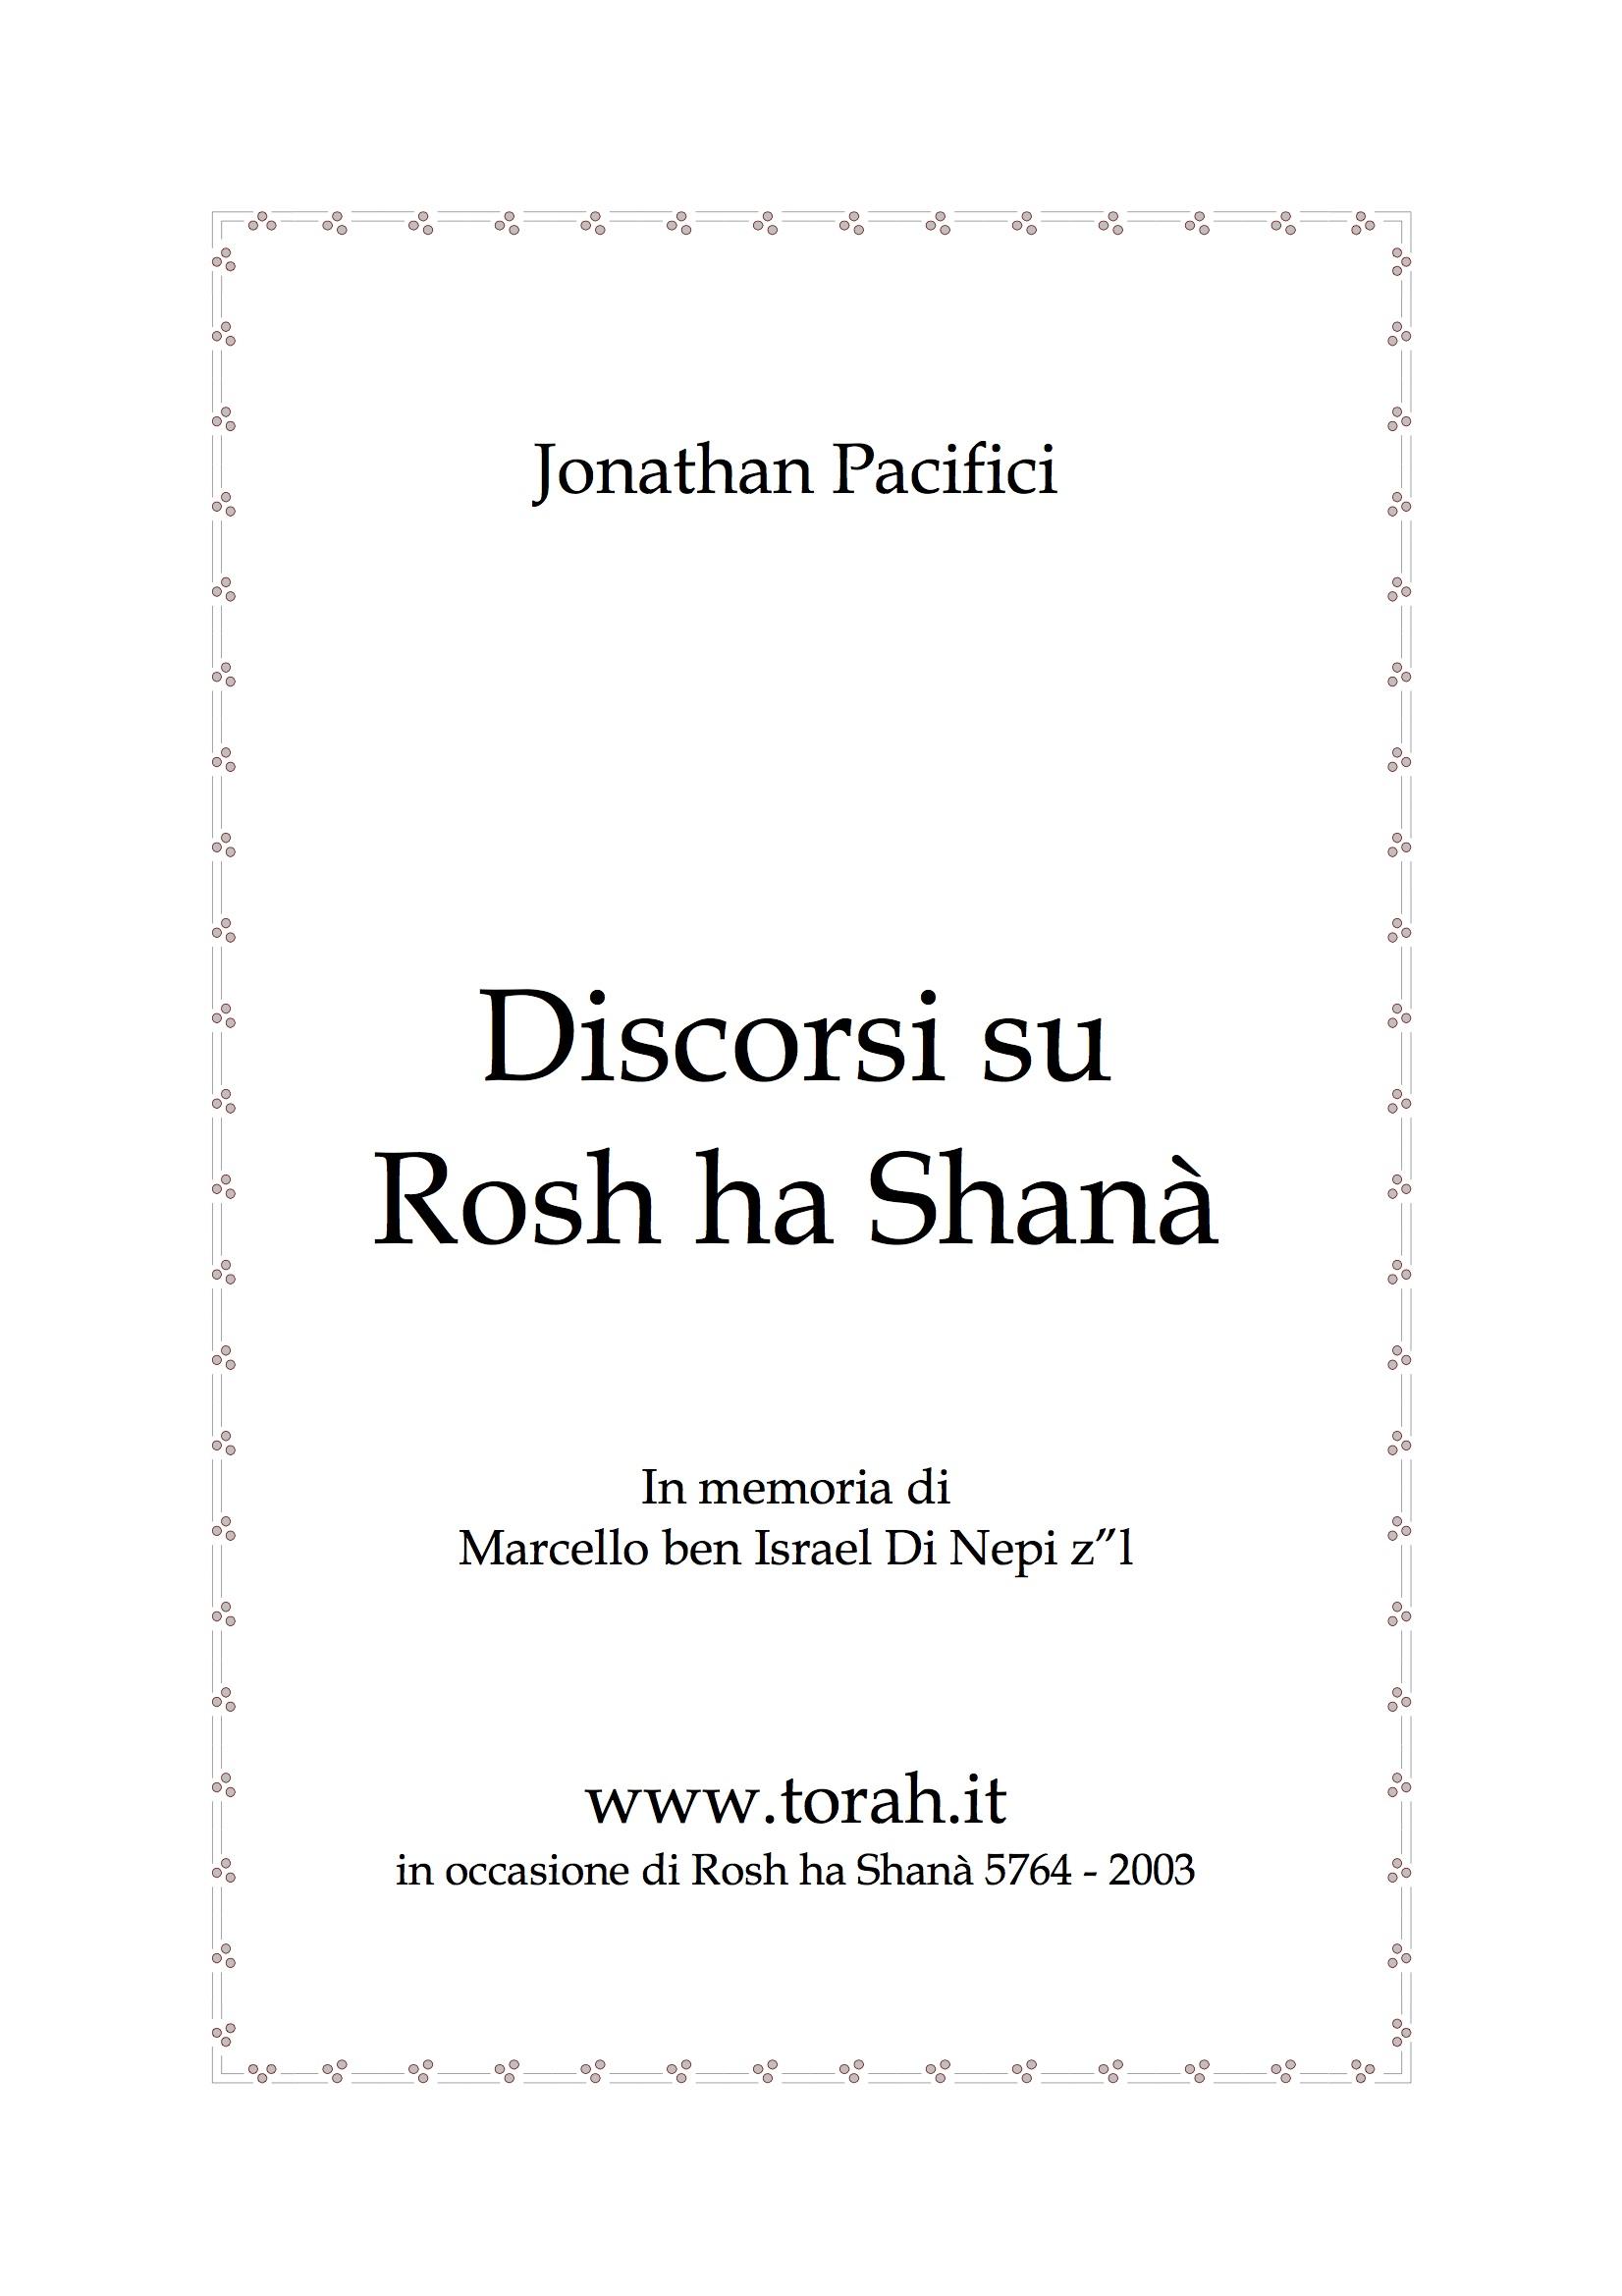 discorsi_su_Rosh_hashanà.jpg